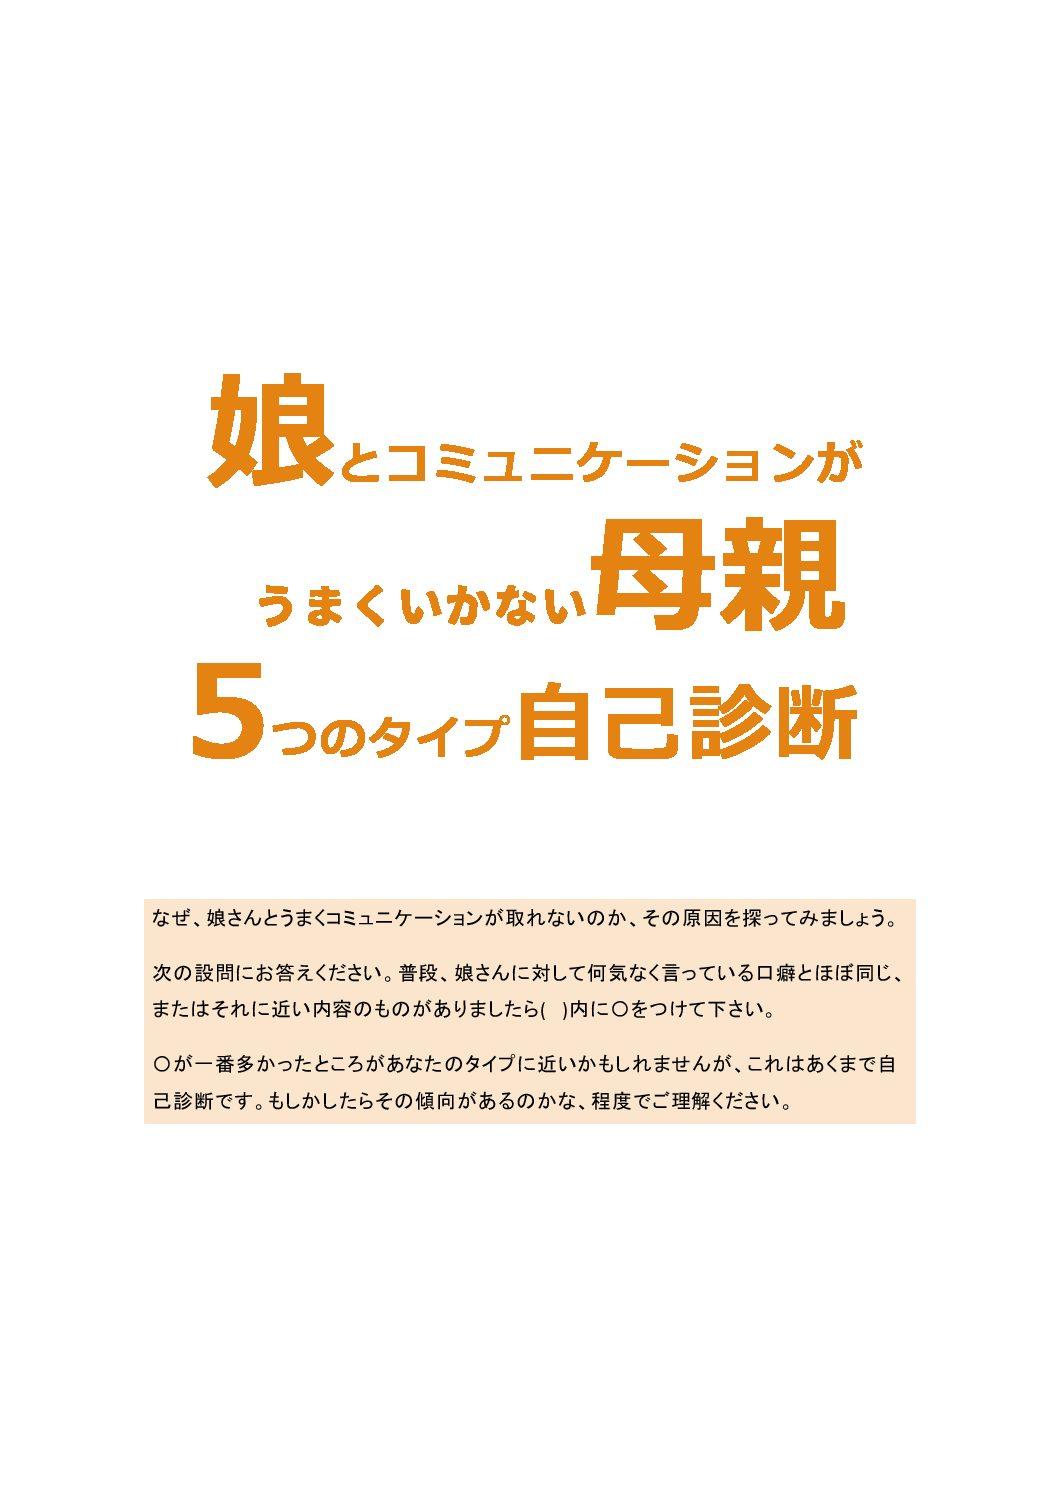 5types-self-check